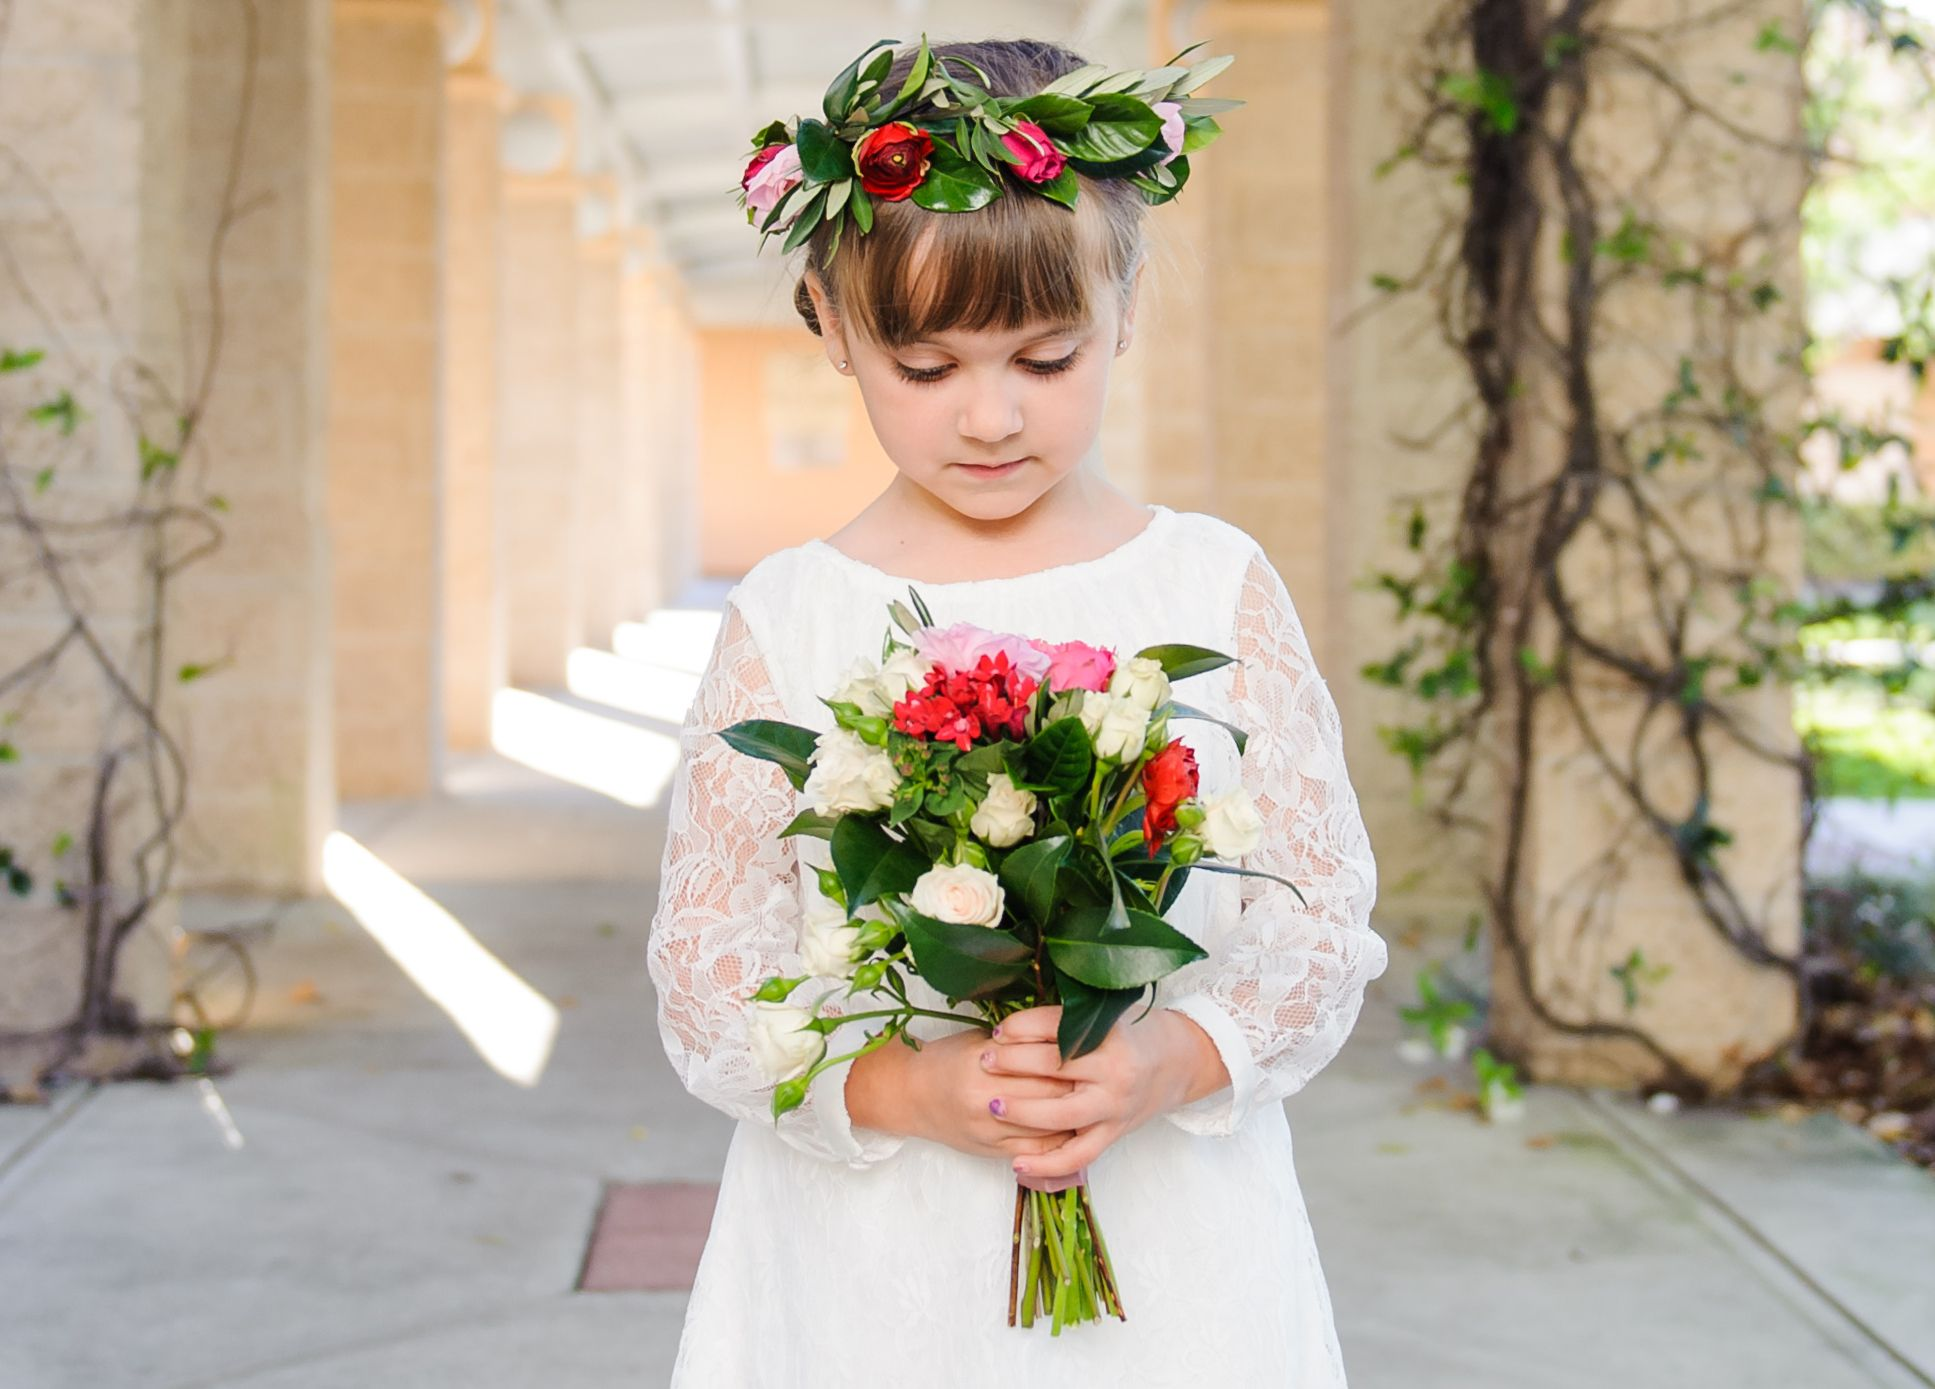 15 stunning flower crowns that top off flower girl style flower red and white flower crown flower girl style 15 flower crowns to complete her izmirmasajfo